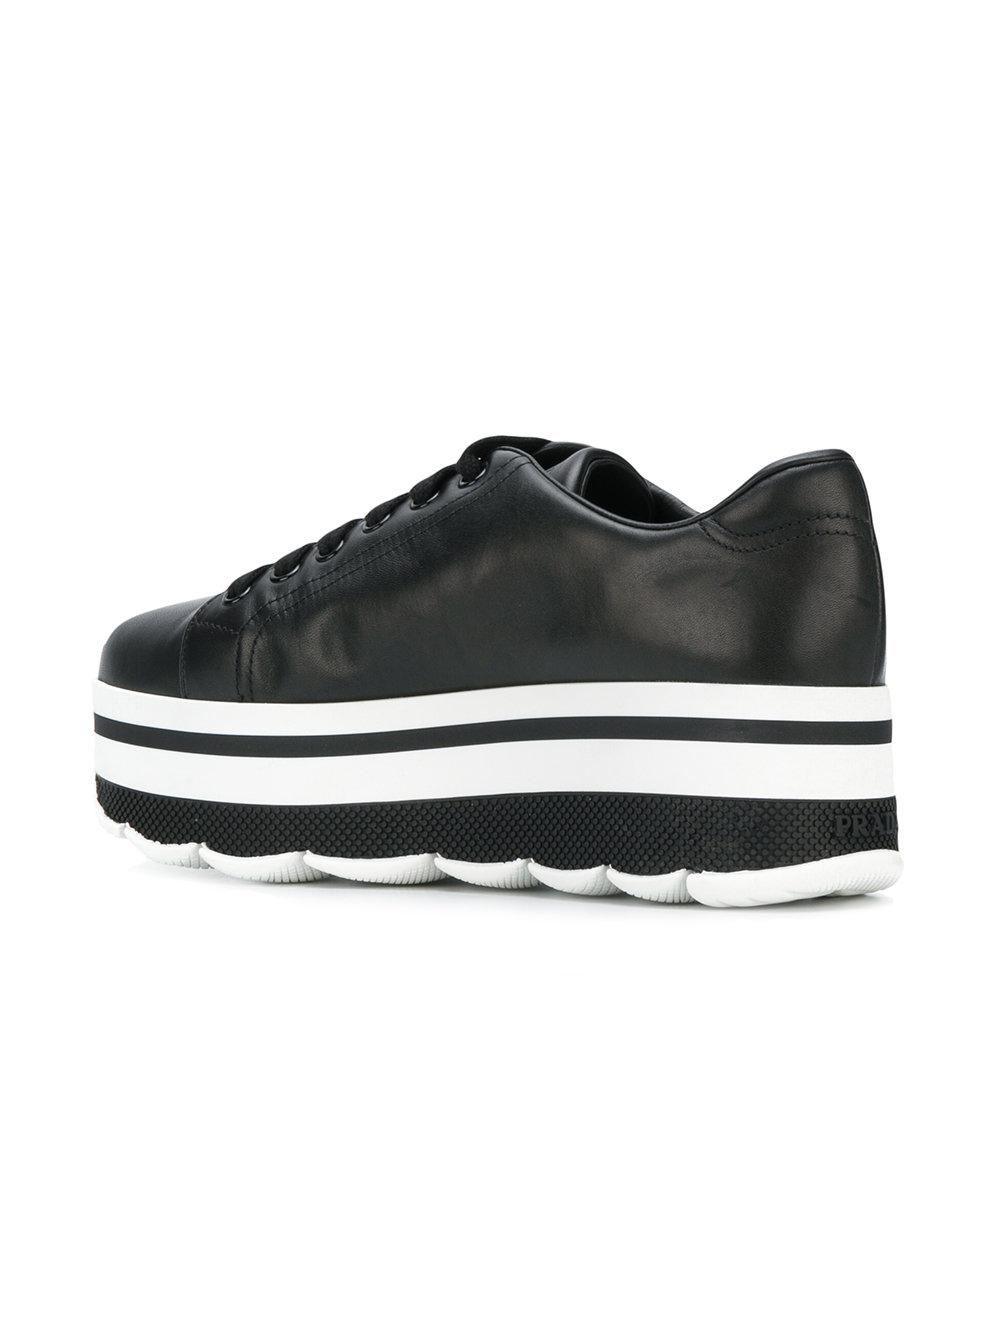 Prada Waved sole platform sneakers E7axE